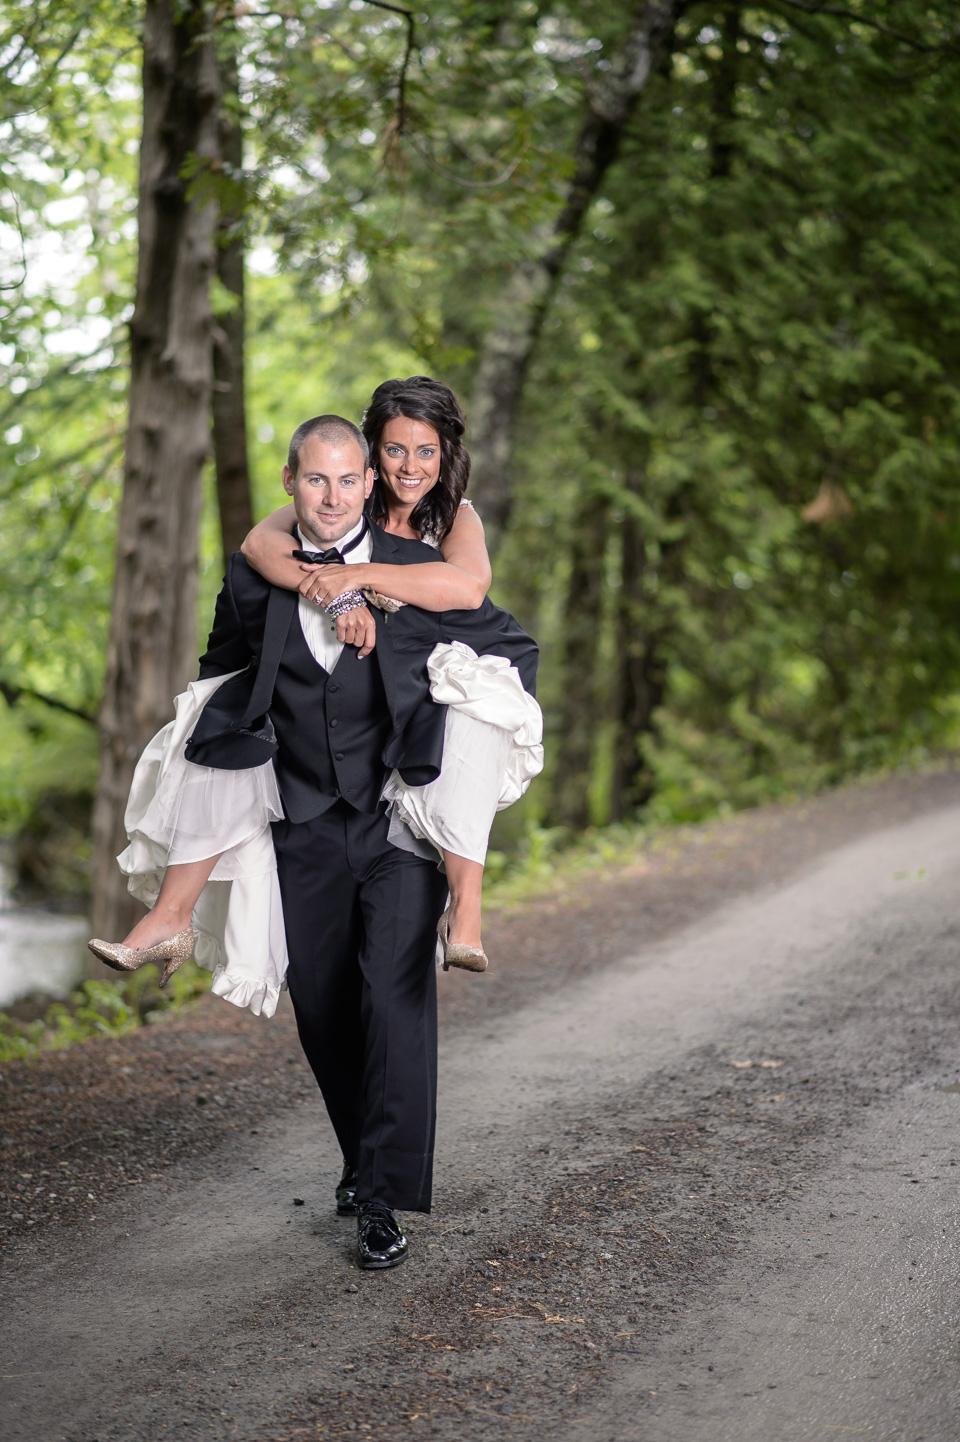 NIgel Fearon Photography | The LeBlanc Wedding-63.jpg